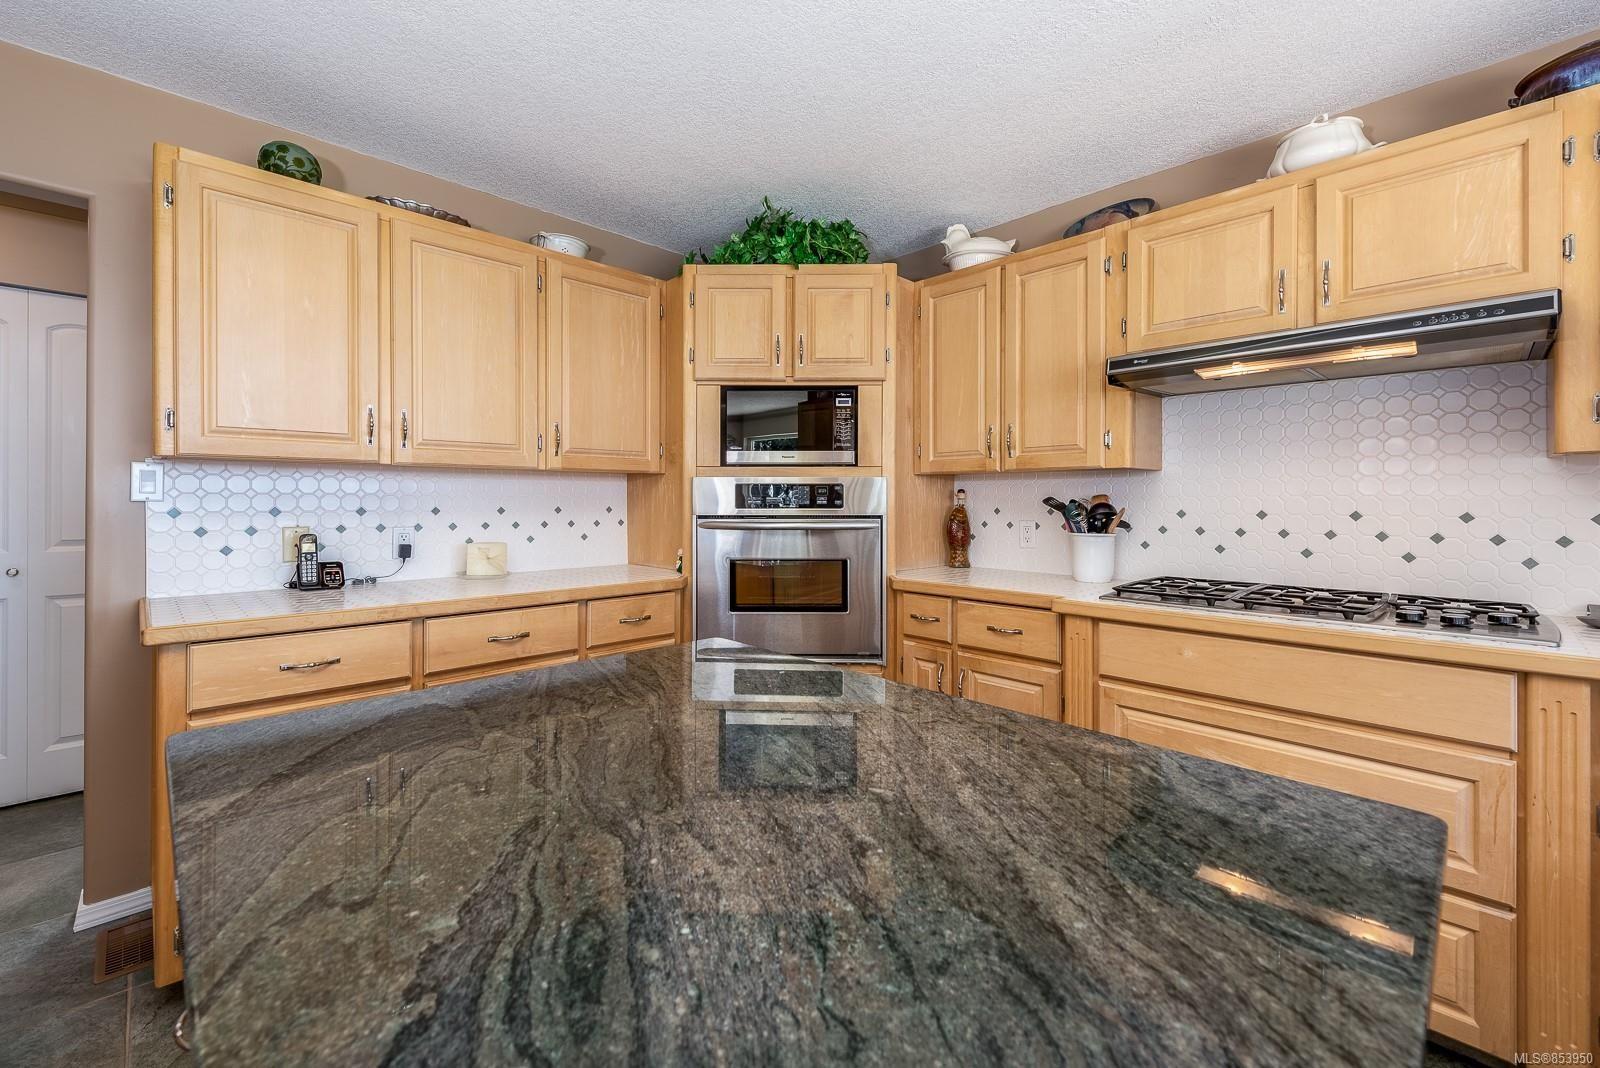 Photo 15: Photos: 5880 GARVIN Rd in : CV Union Bay/Fanny Bay House for sale (Comox Valley)  : MLS®# 853950